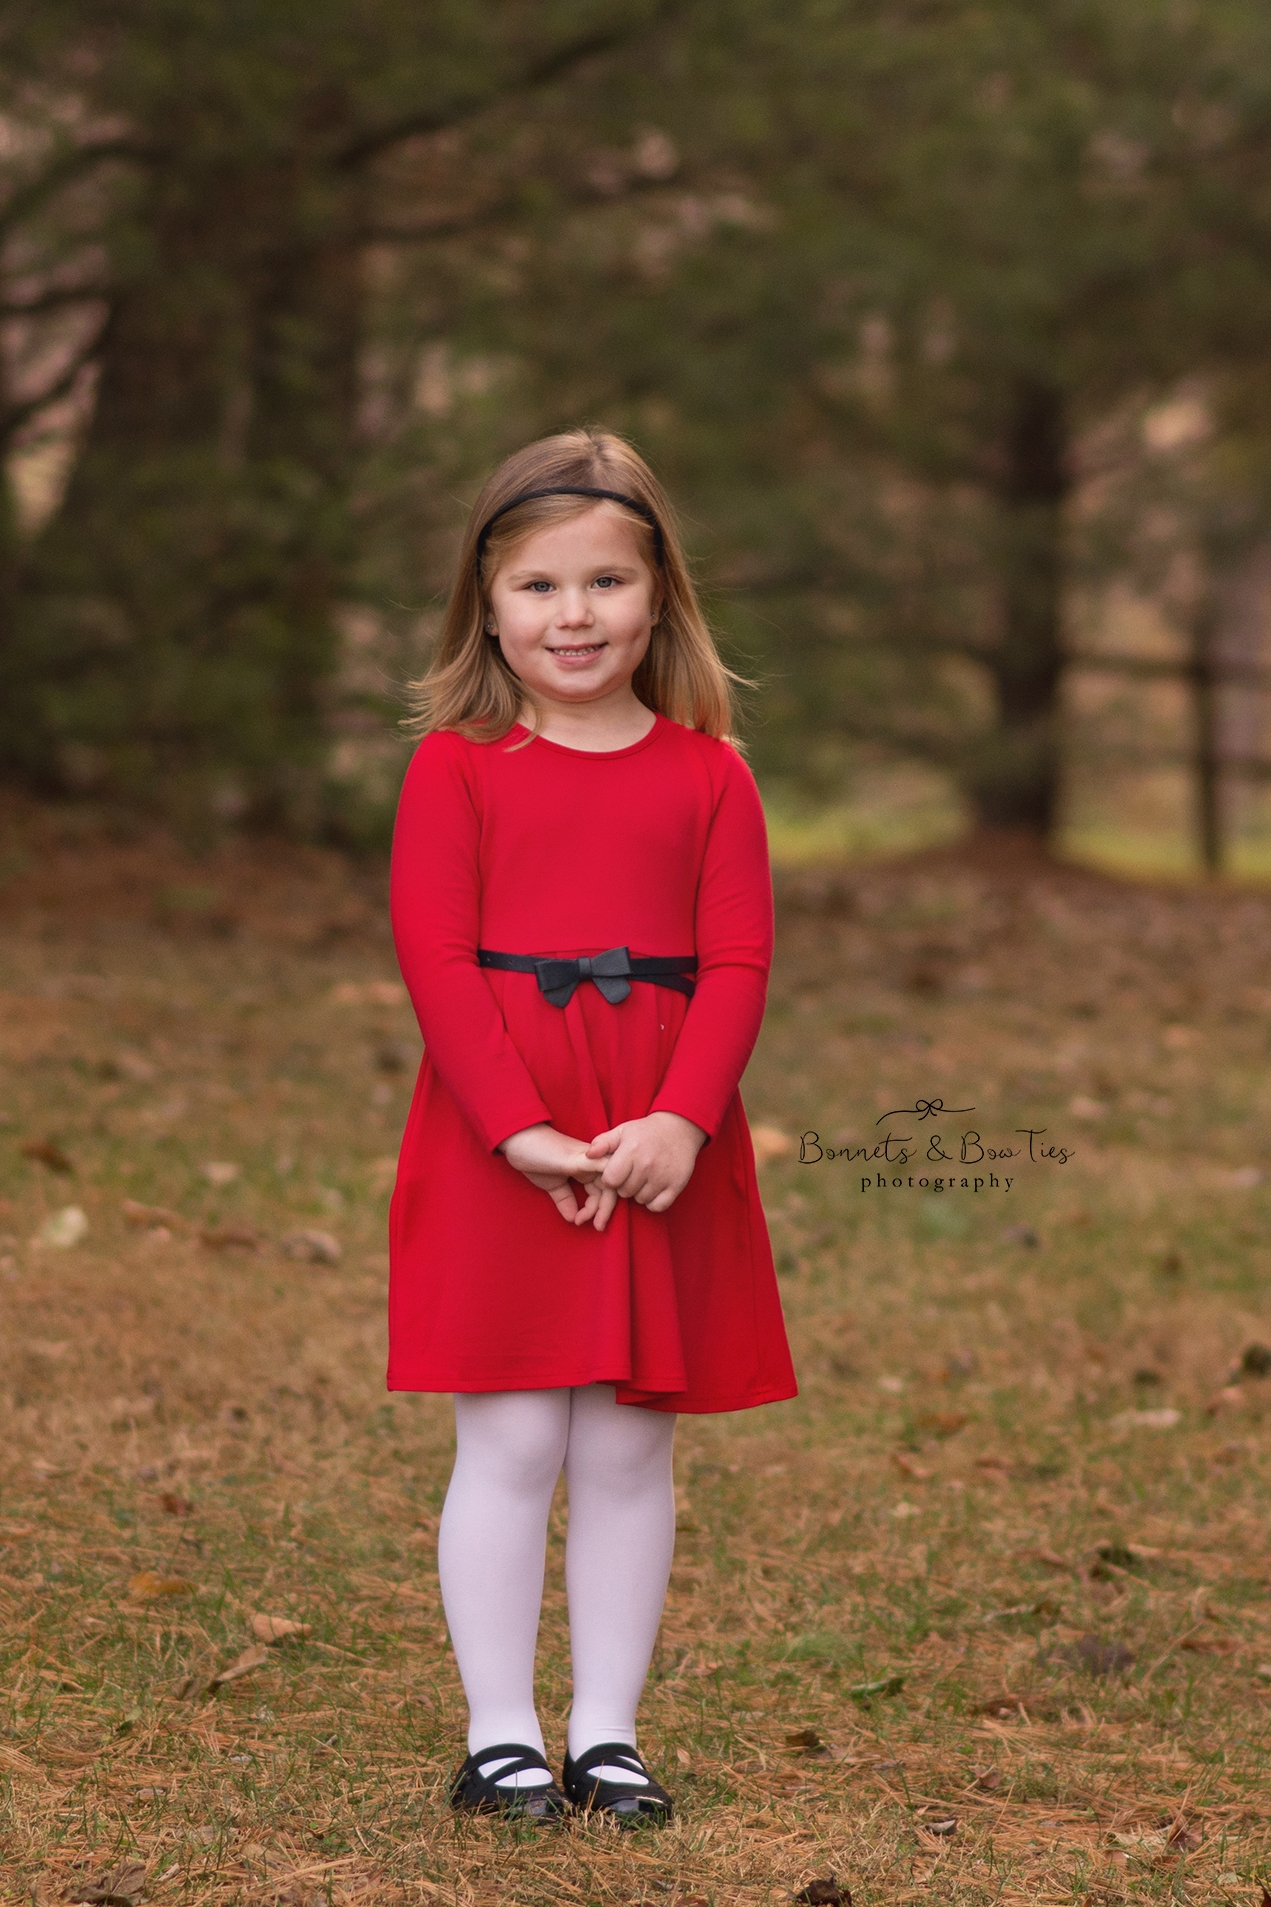 Little girl wearing red in Christmas portrait.jpg